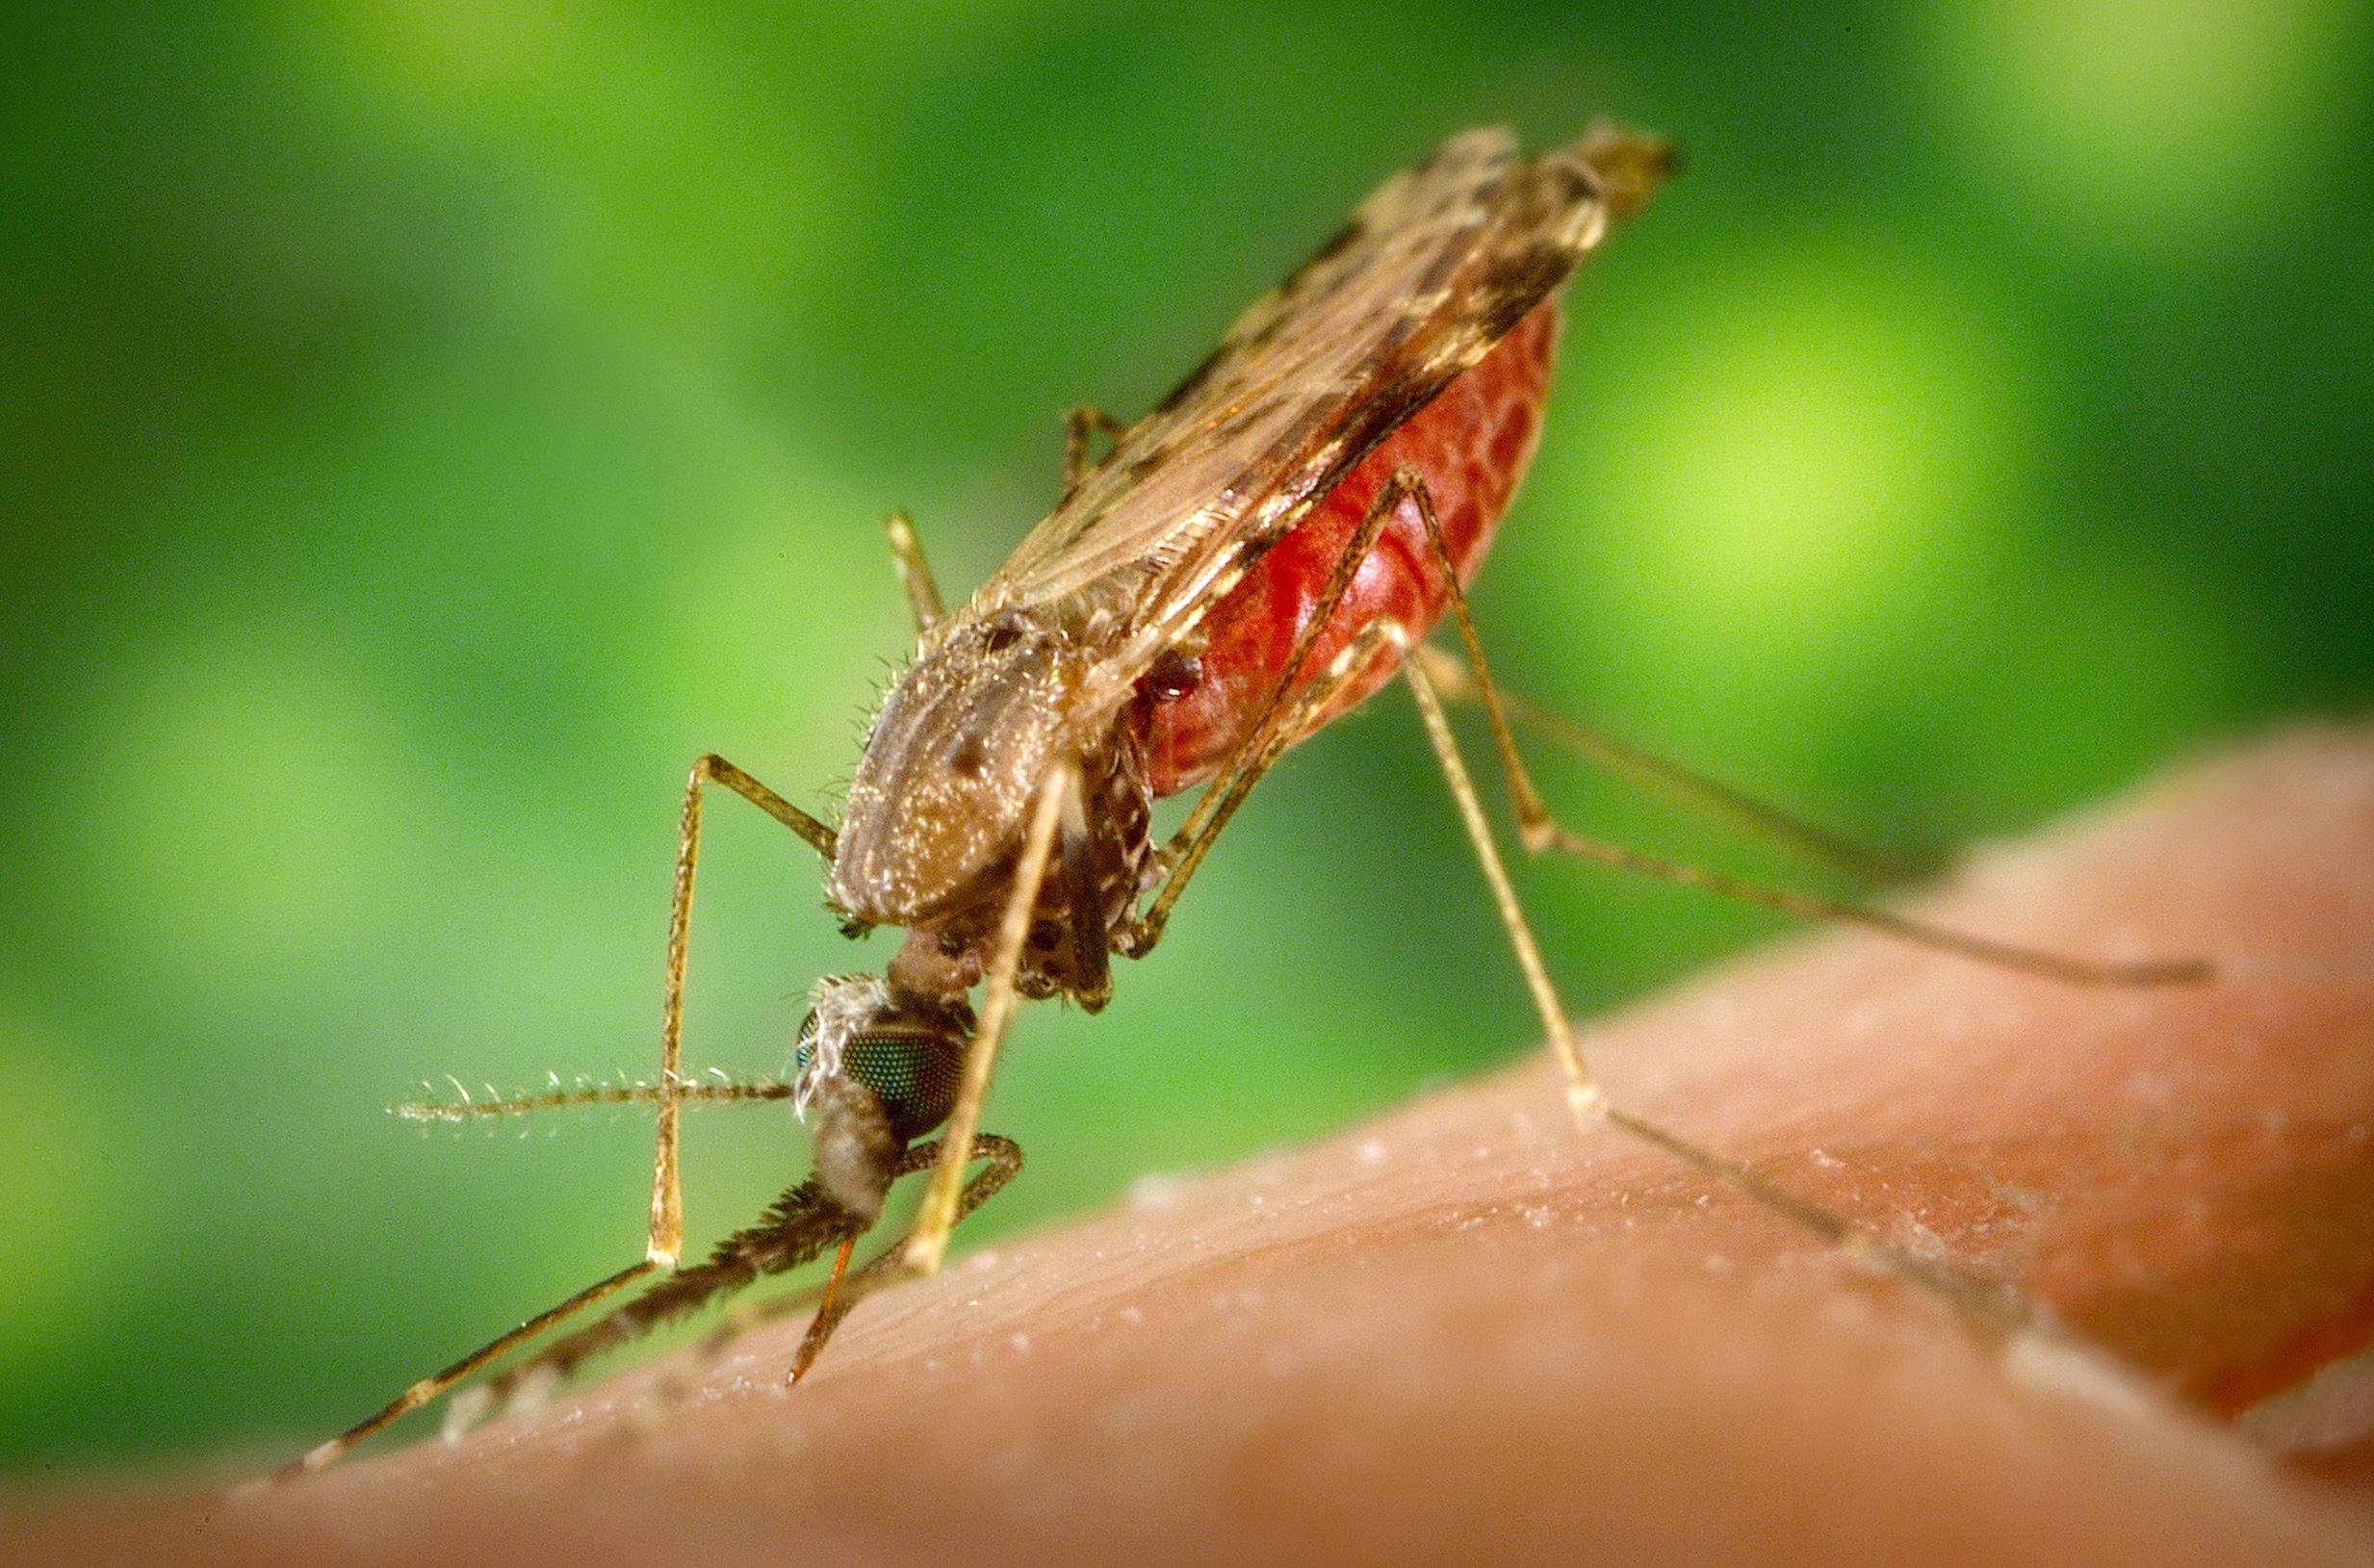 Anopheles_albimanus_mosquito.jpg